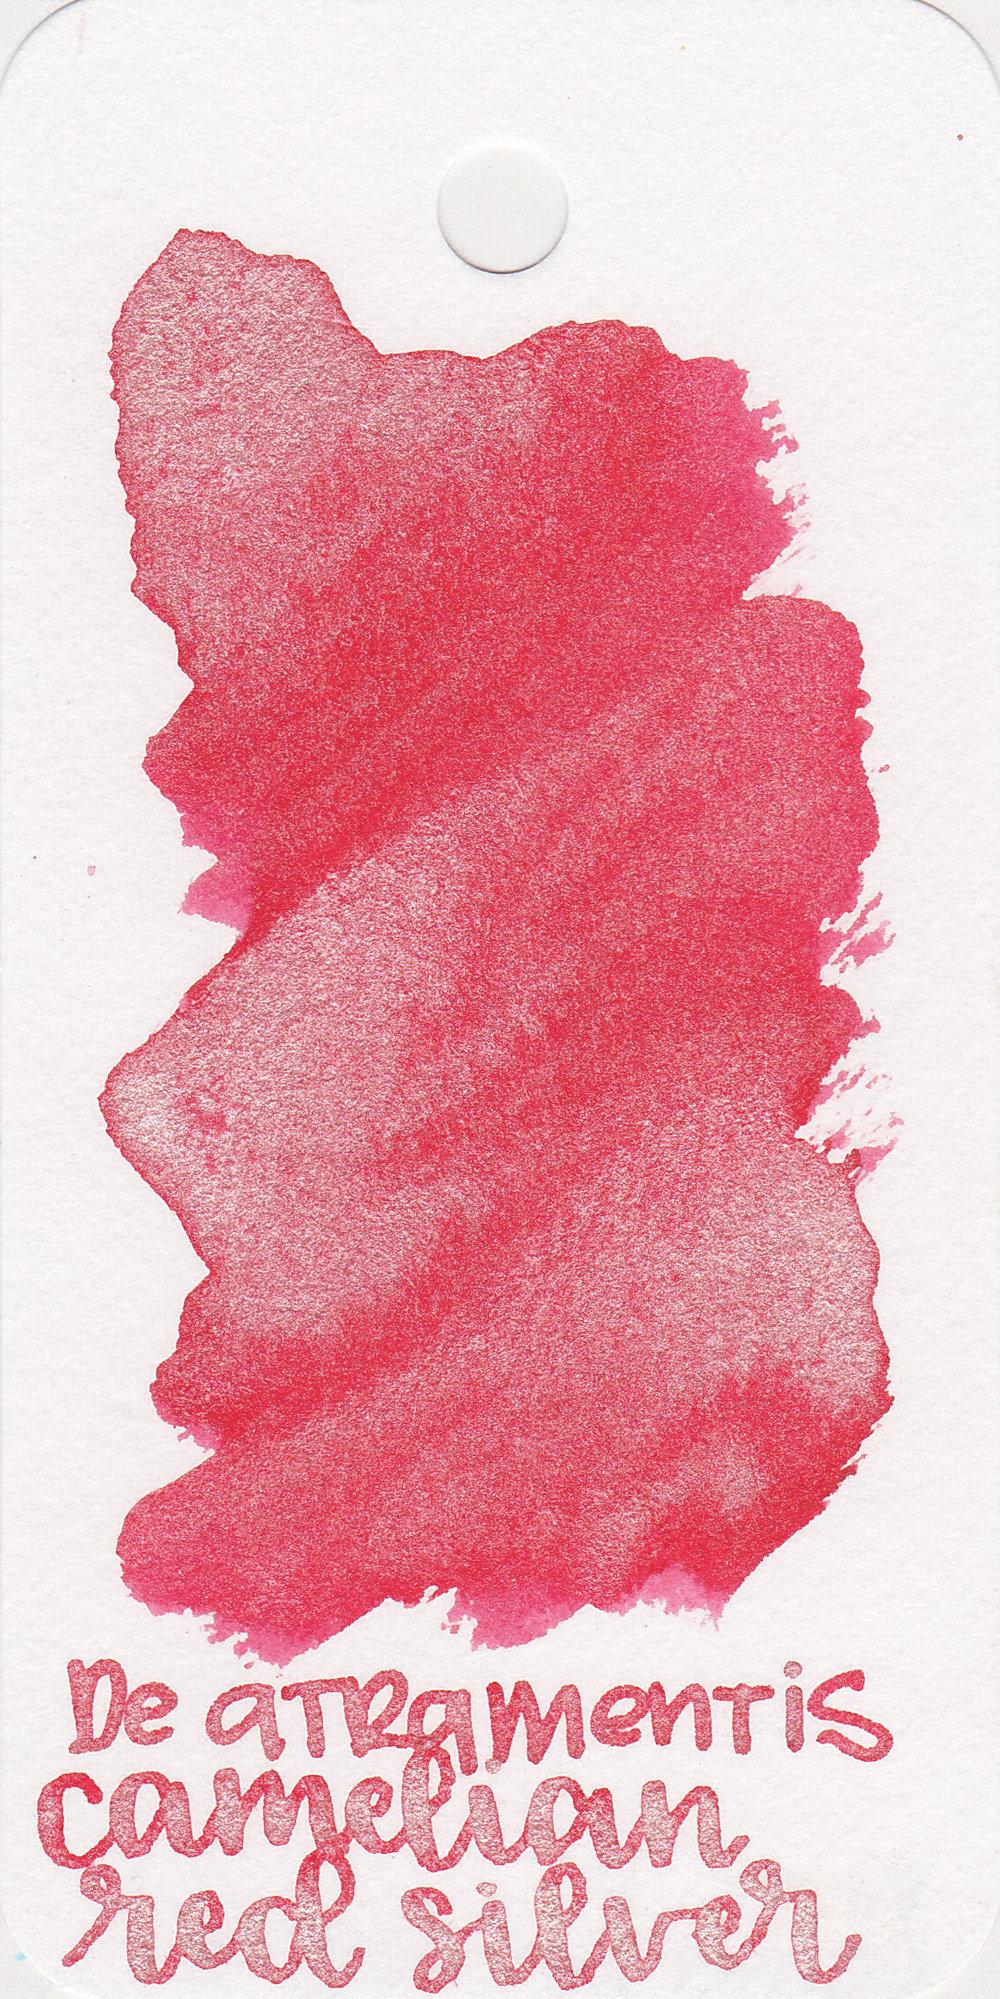 da-camelian-red-2.jpg